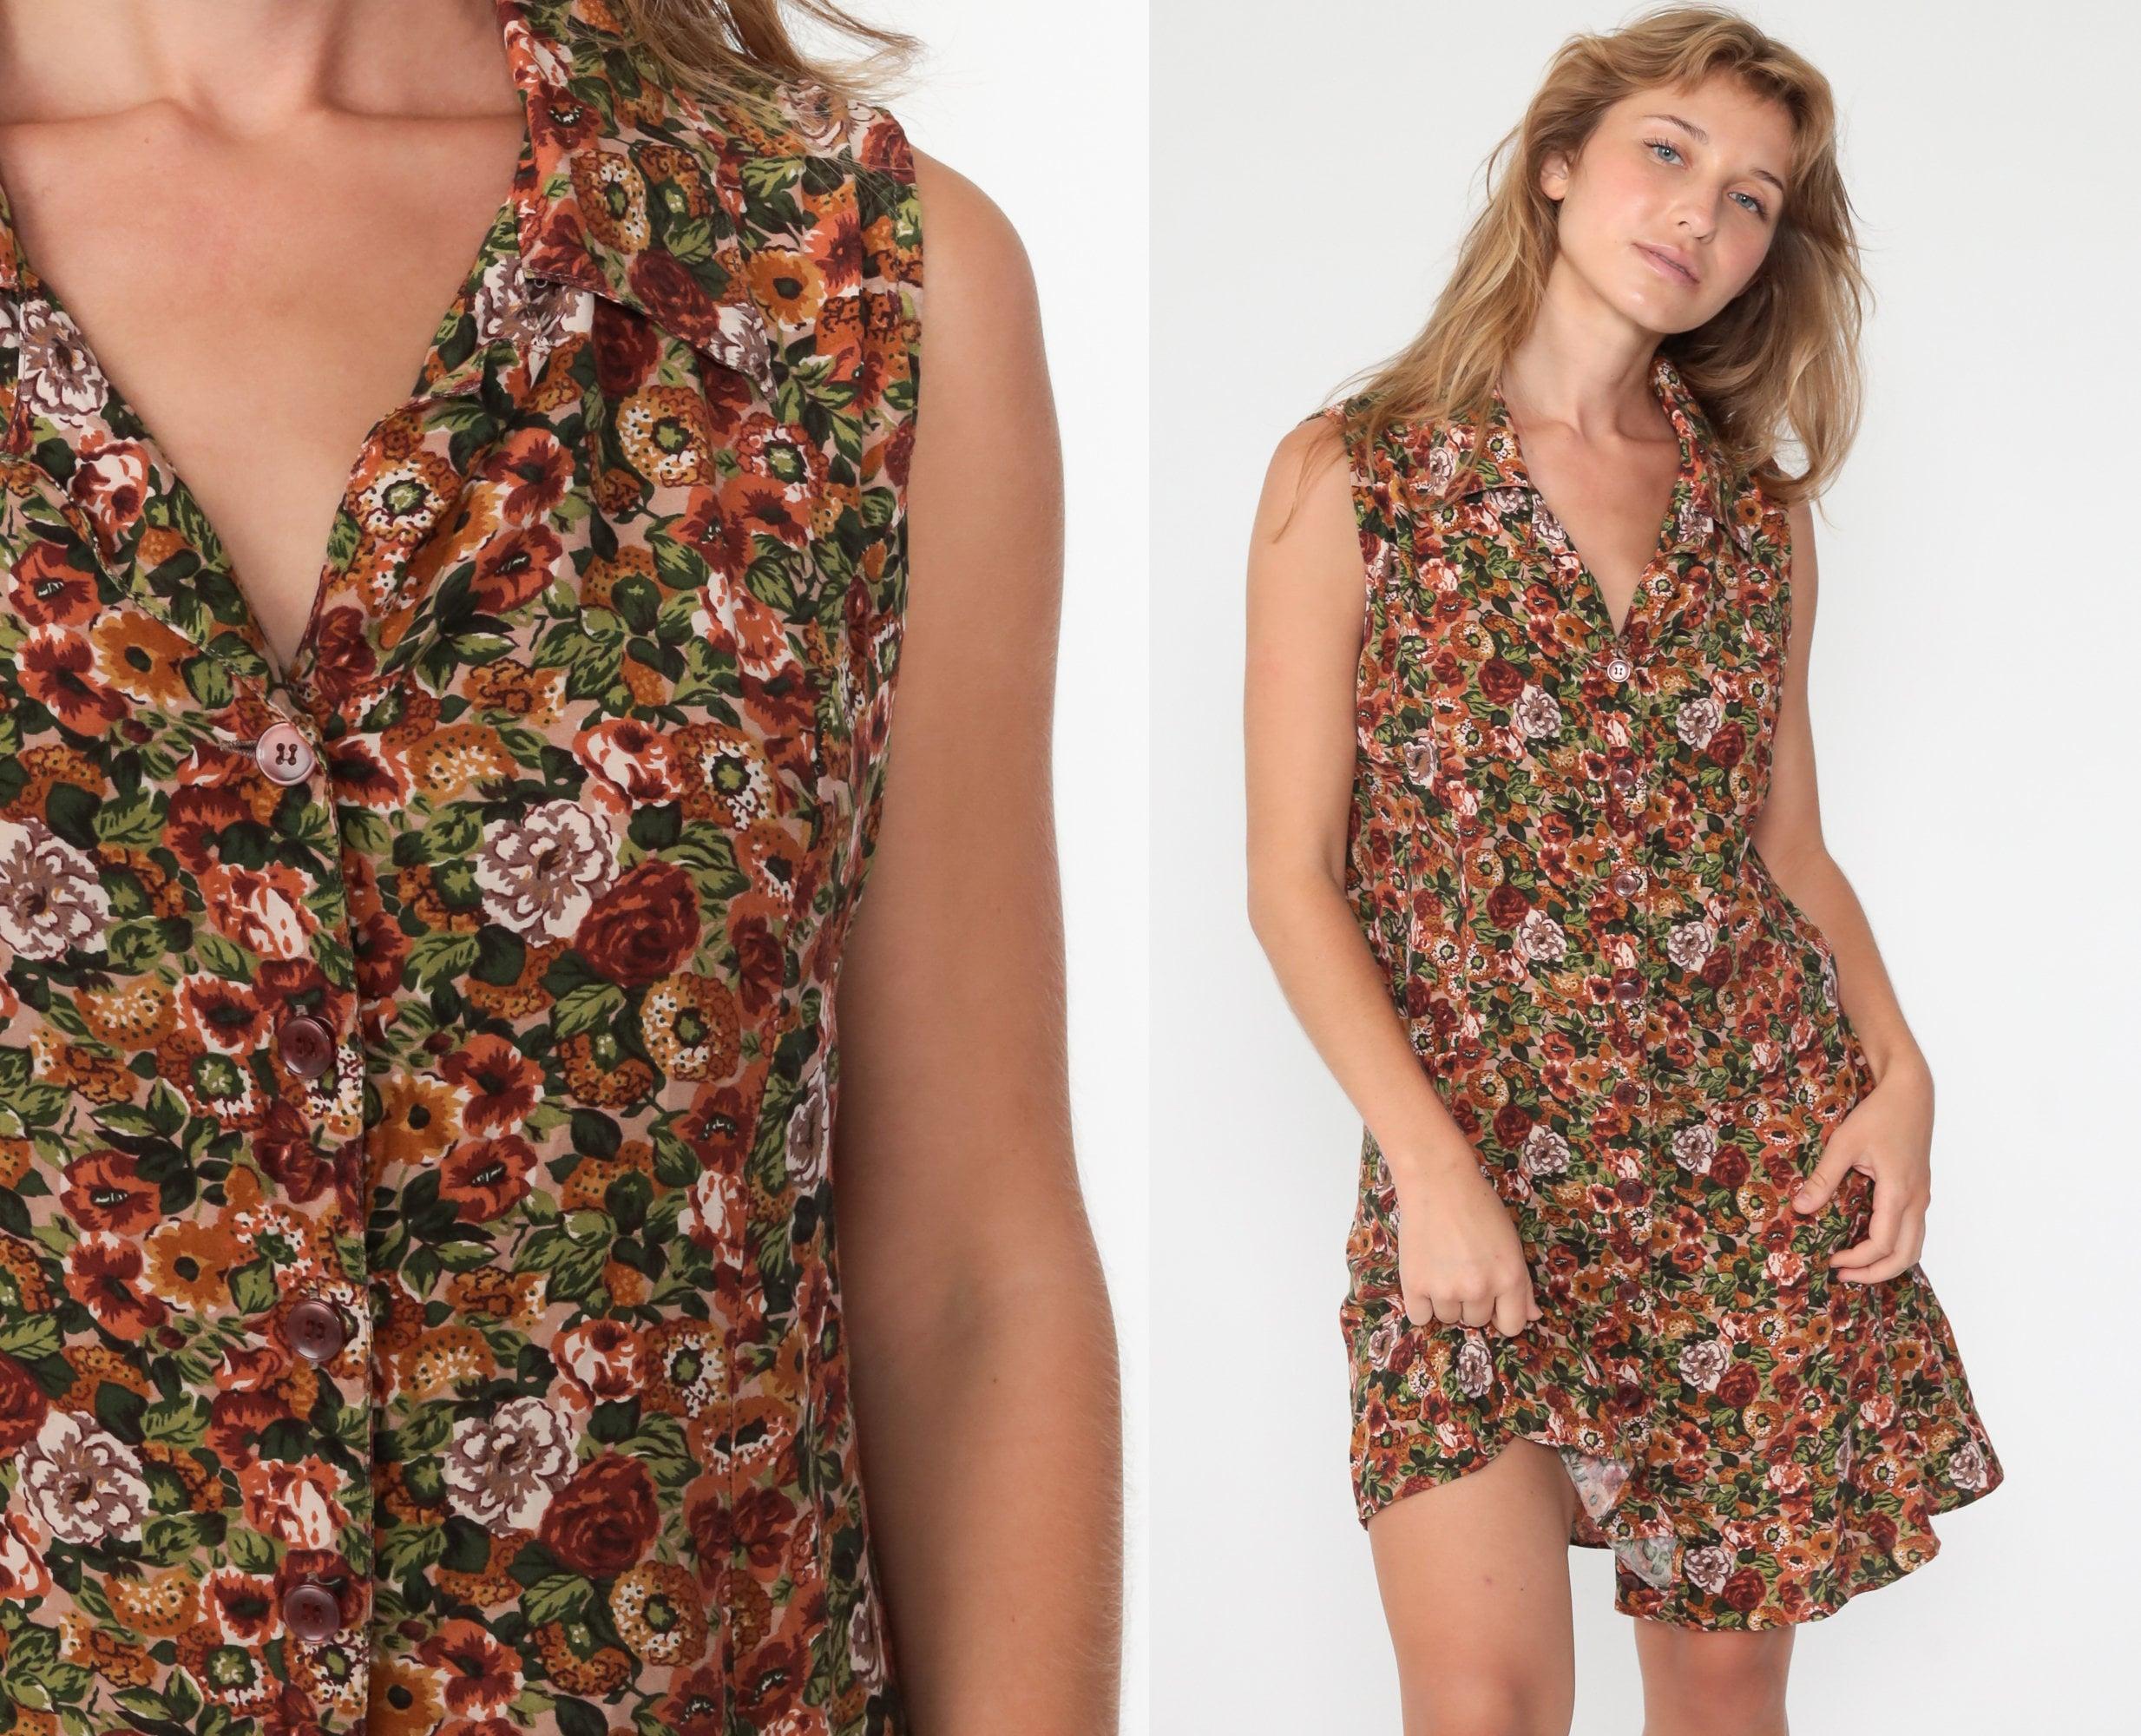 Embossed Floral Dress 90s Green Floral Mini Slip Dress Boho Long Sleeve 1990s Bohemian Shift Vintage Bohemian Hippie Minidress Small Medium